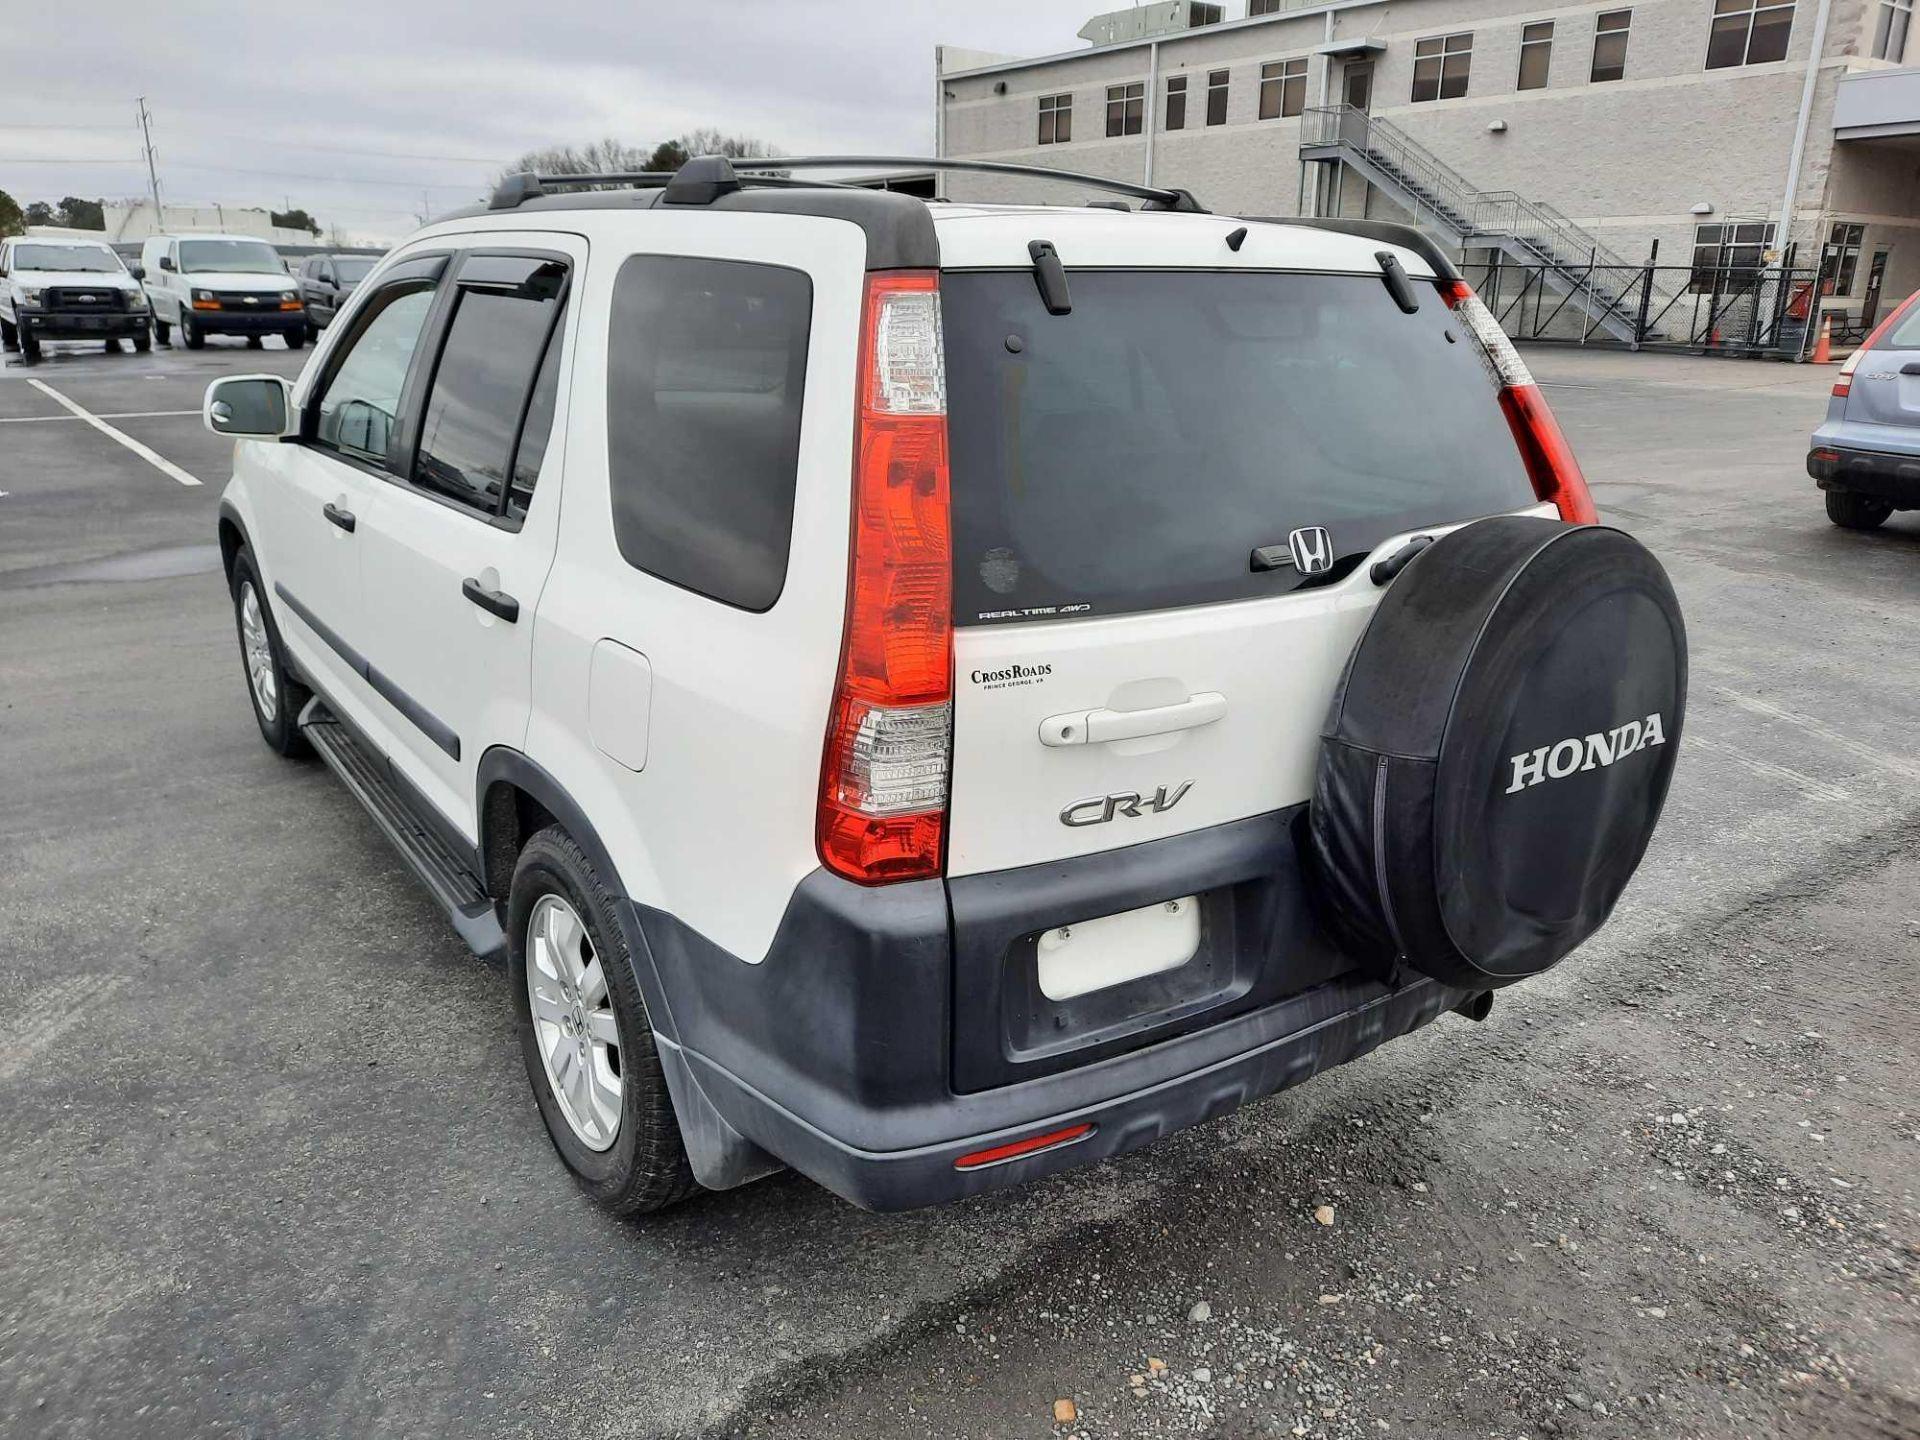 2005 HONDA CR-V - Image 2 of 18